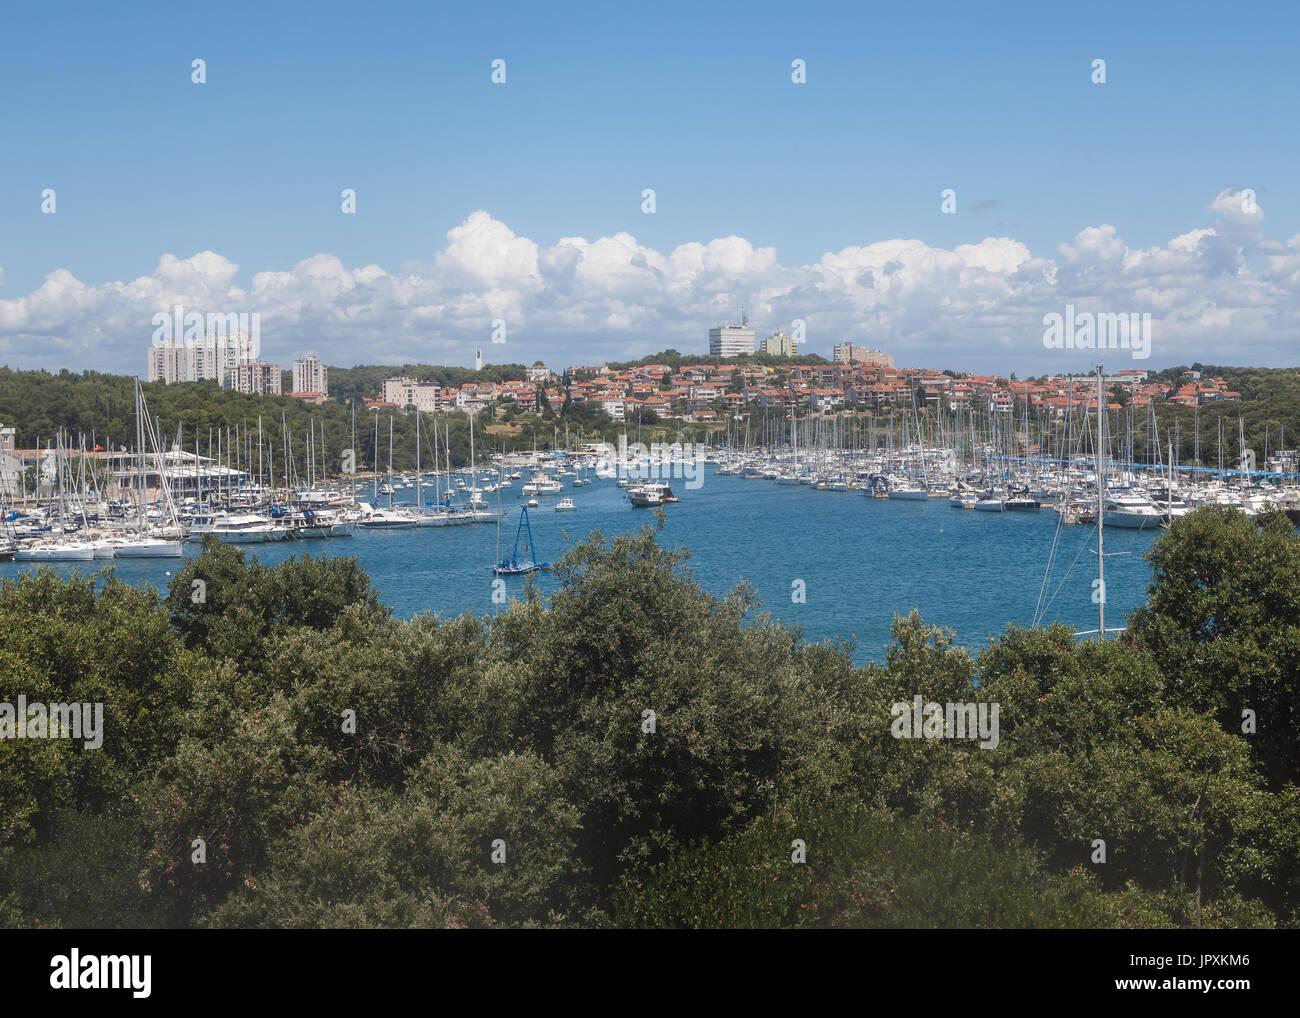 Marina in Verudela, Pula, Croazia - Stock Image